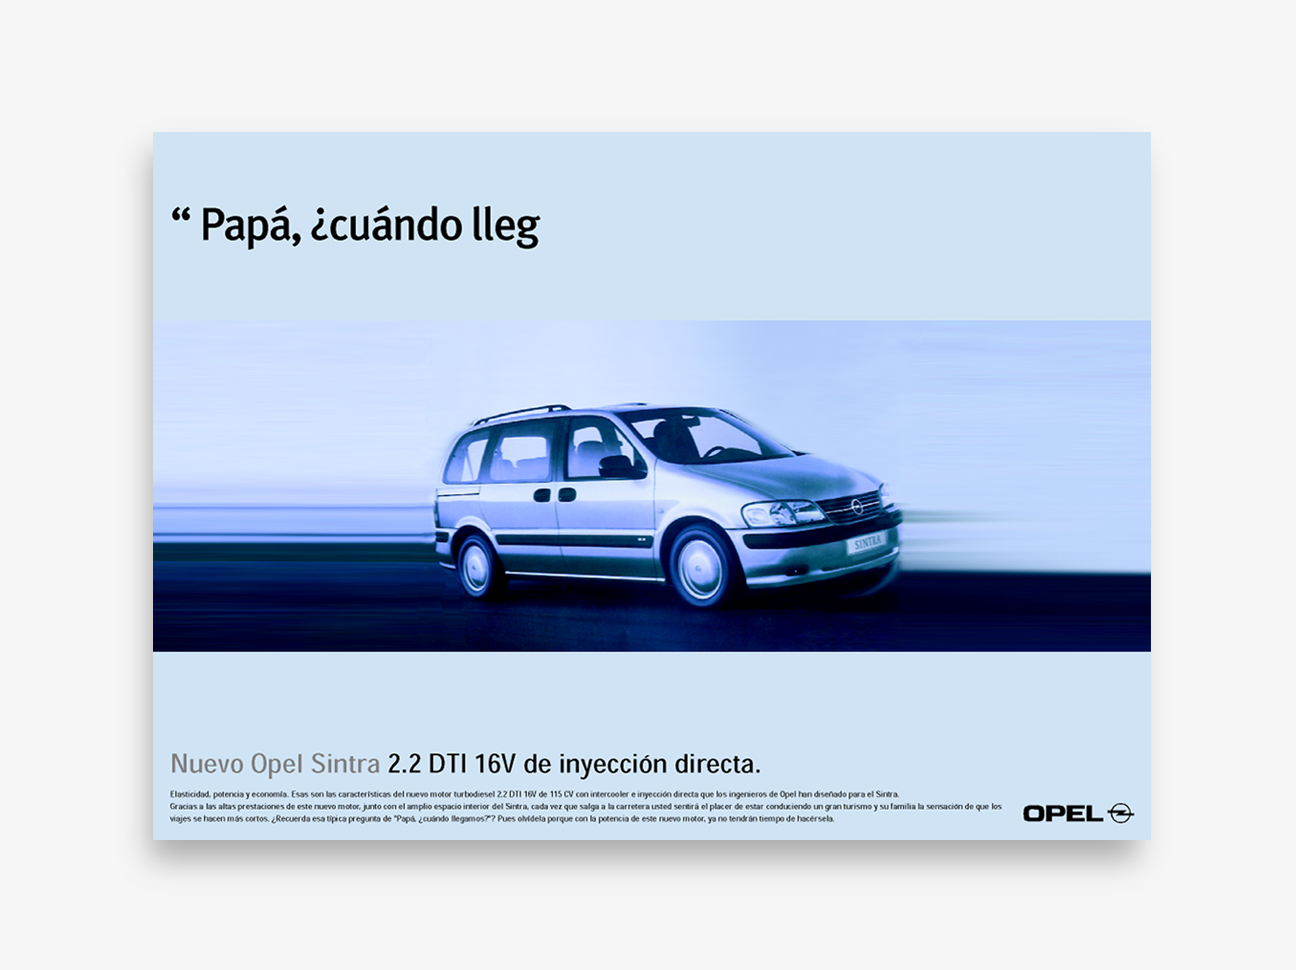 Opel Sintra - Papá